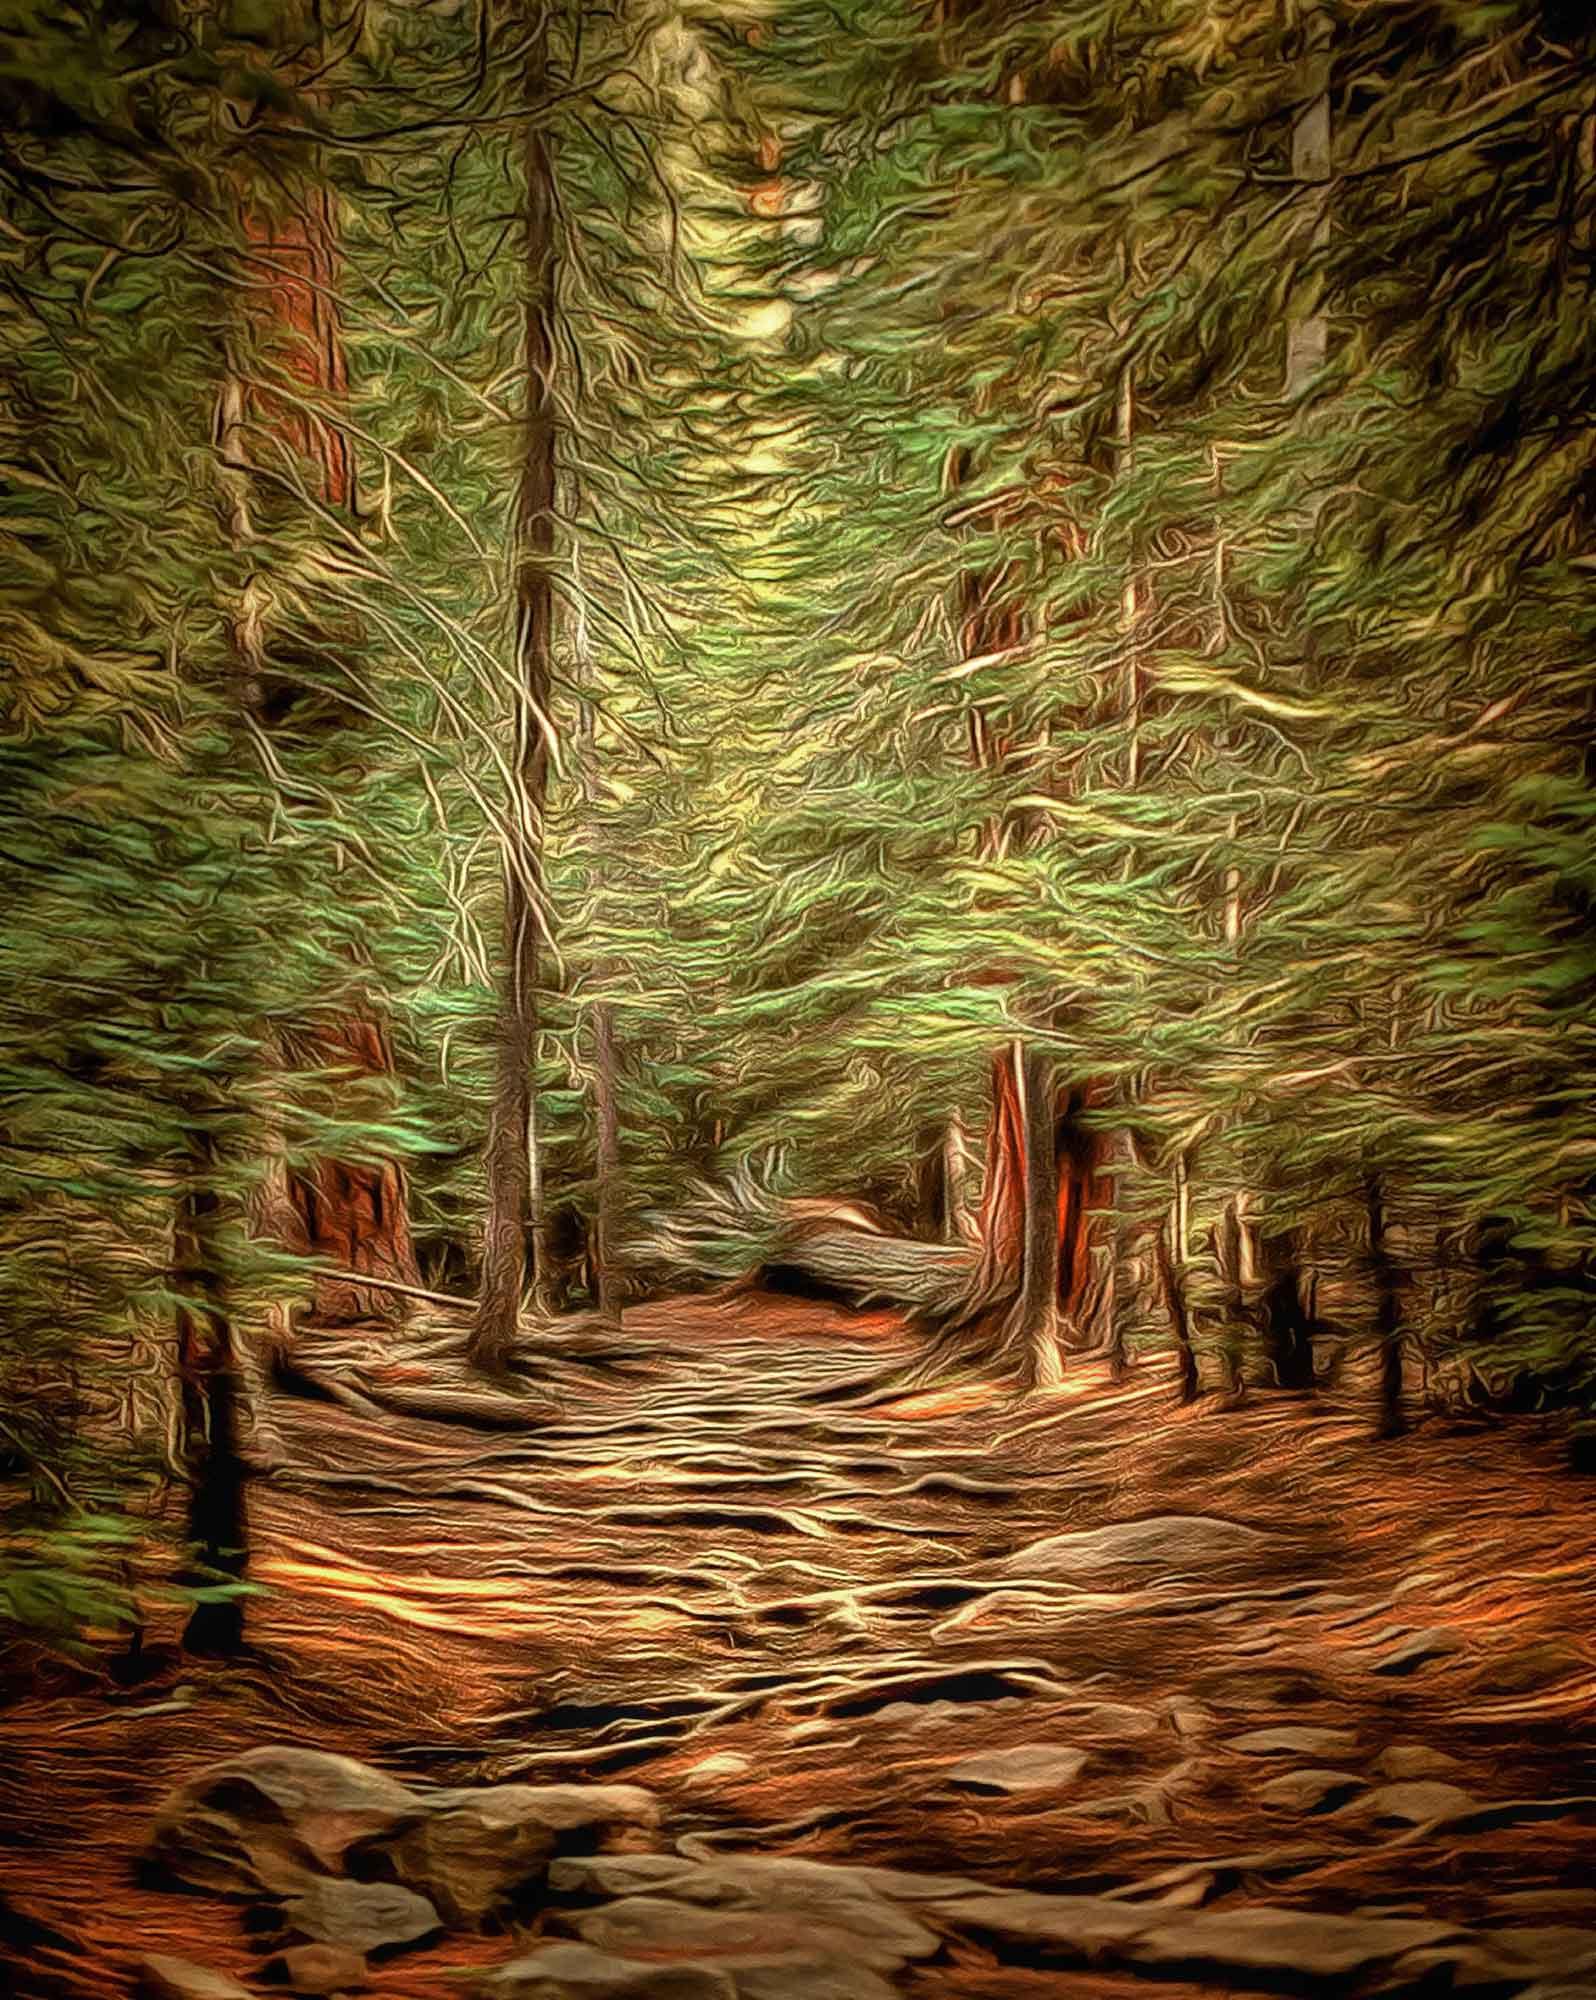 SmithG_enchanted_forest24x30LR.jpg